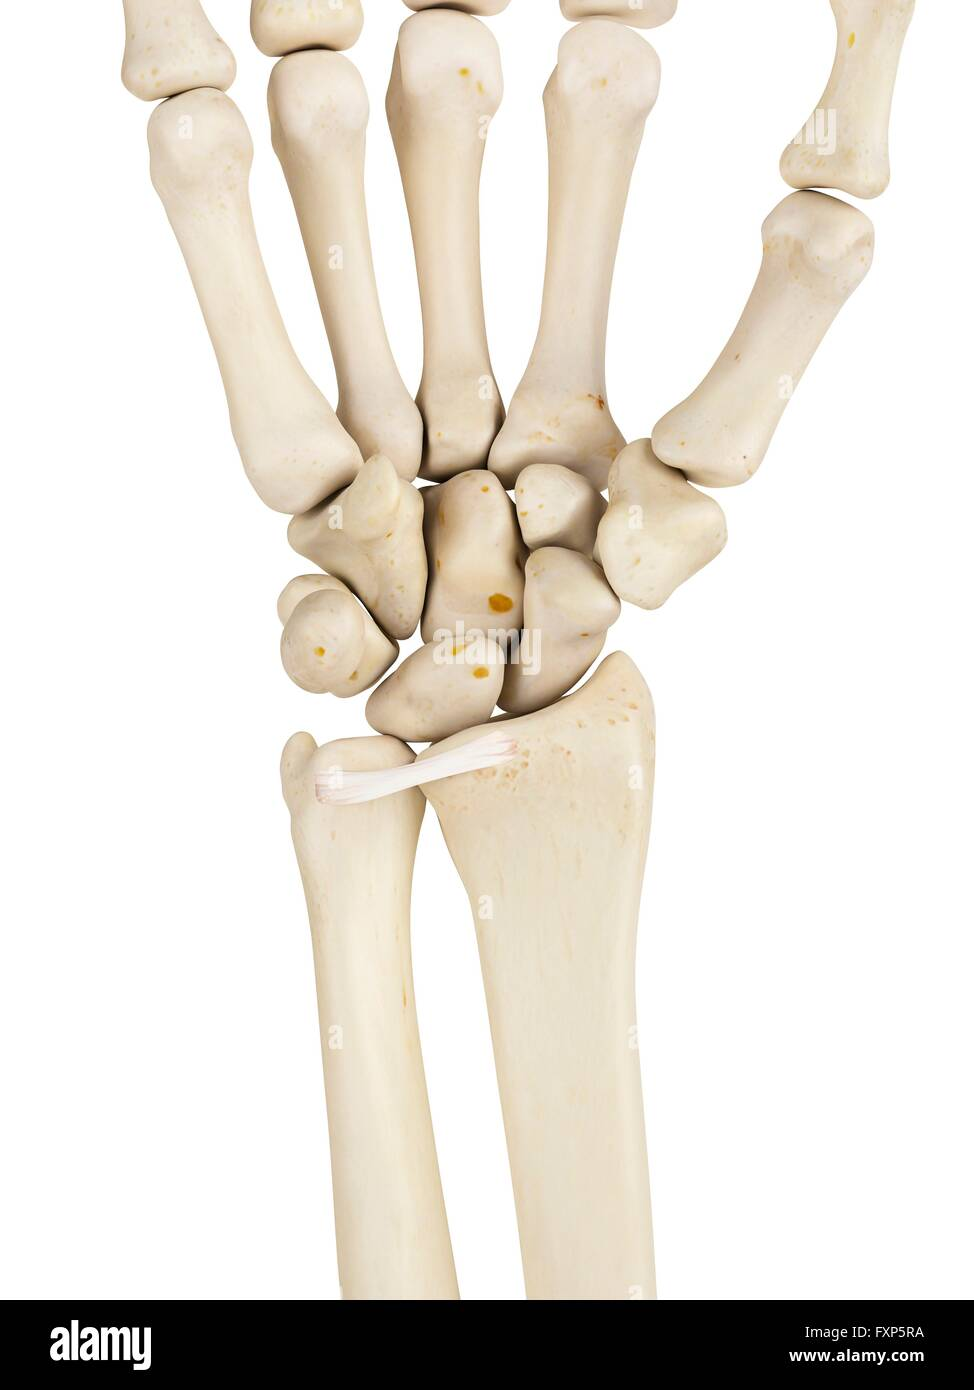 Human Wrist Bones Computer Illustration Stock Photo 102520414 Alamy